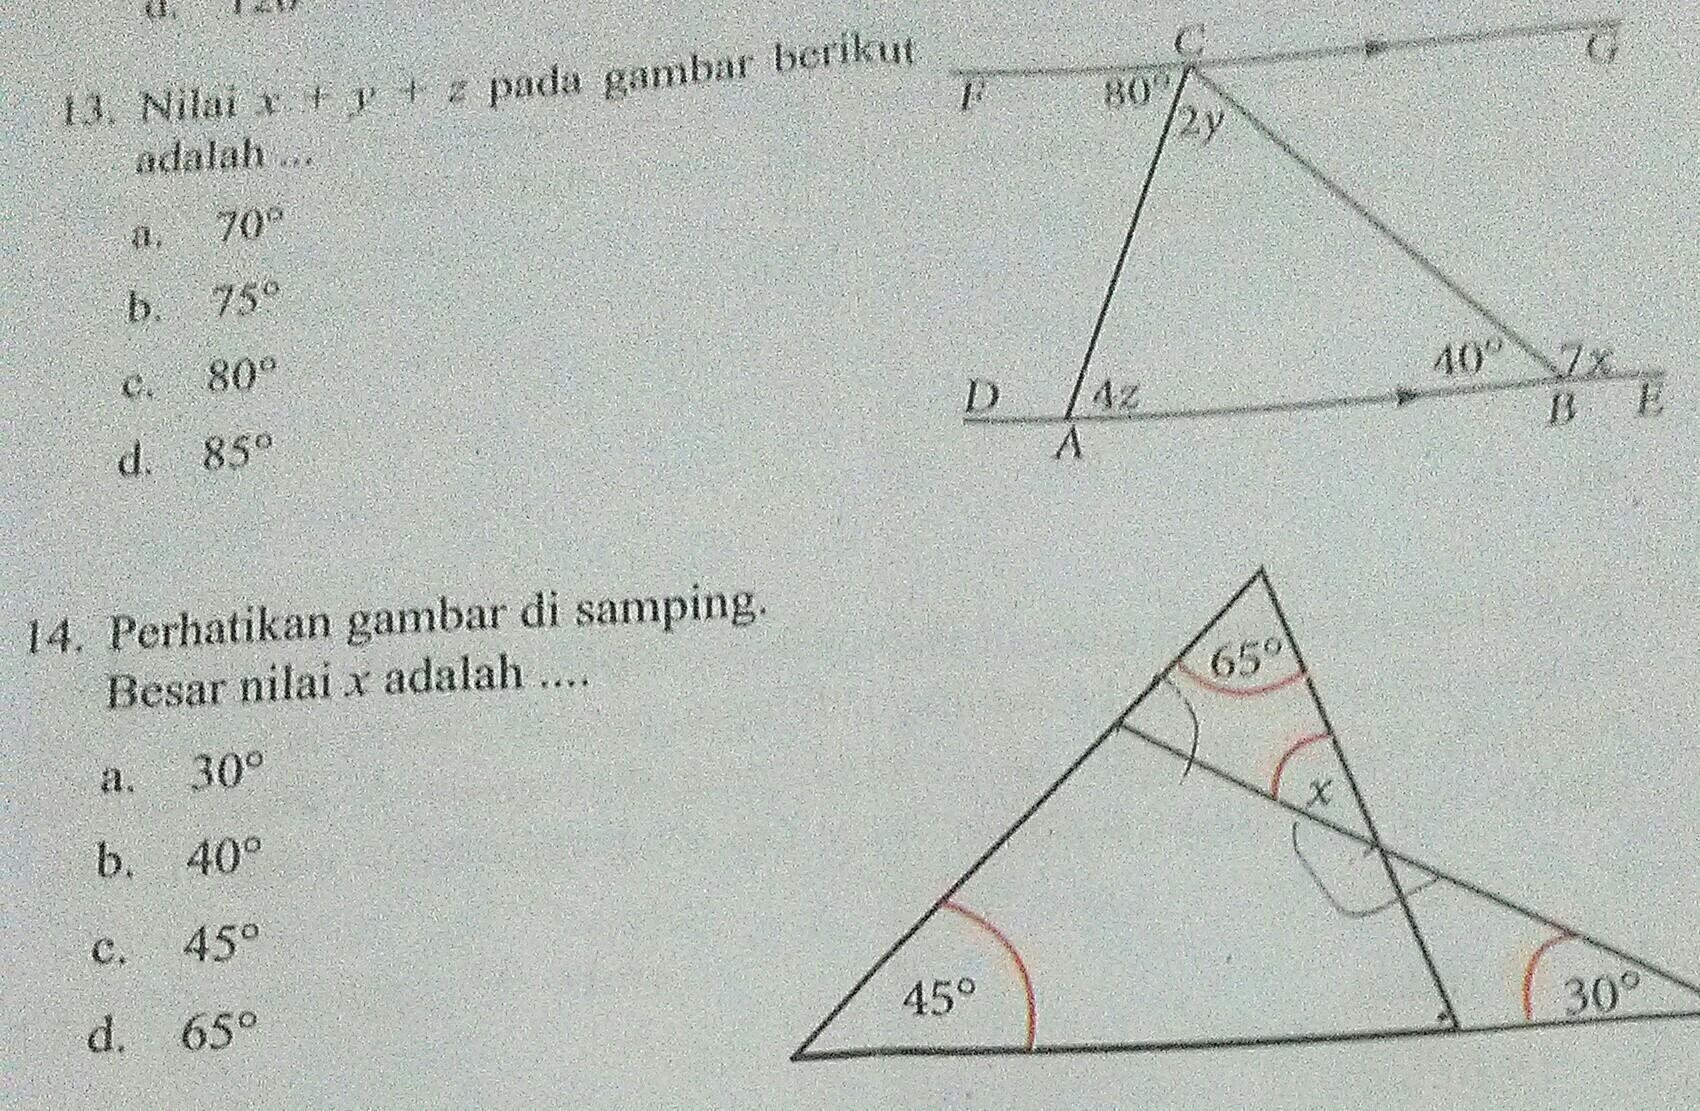 13.Nilai x+y+z pada gambar berikut adalah a.70°b.75°c.80°d ...